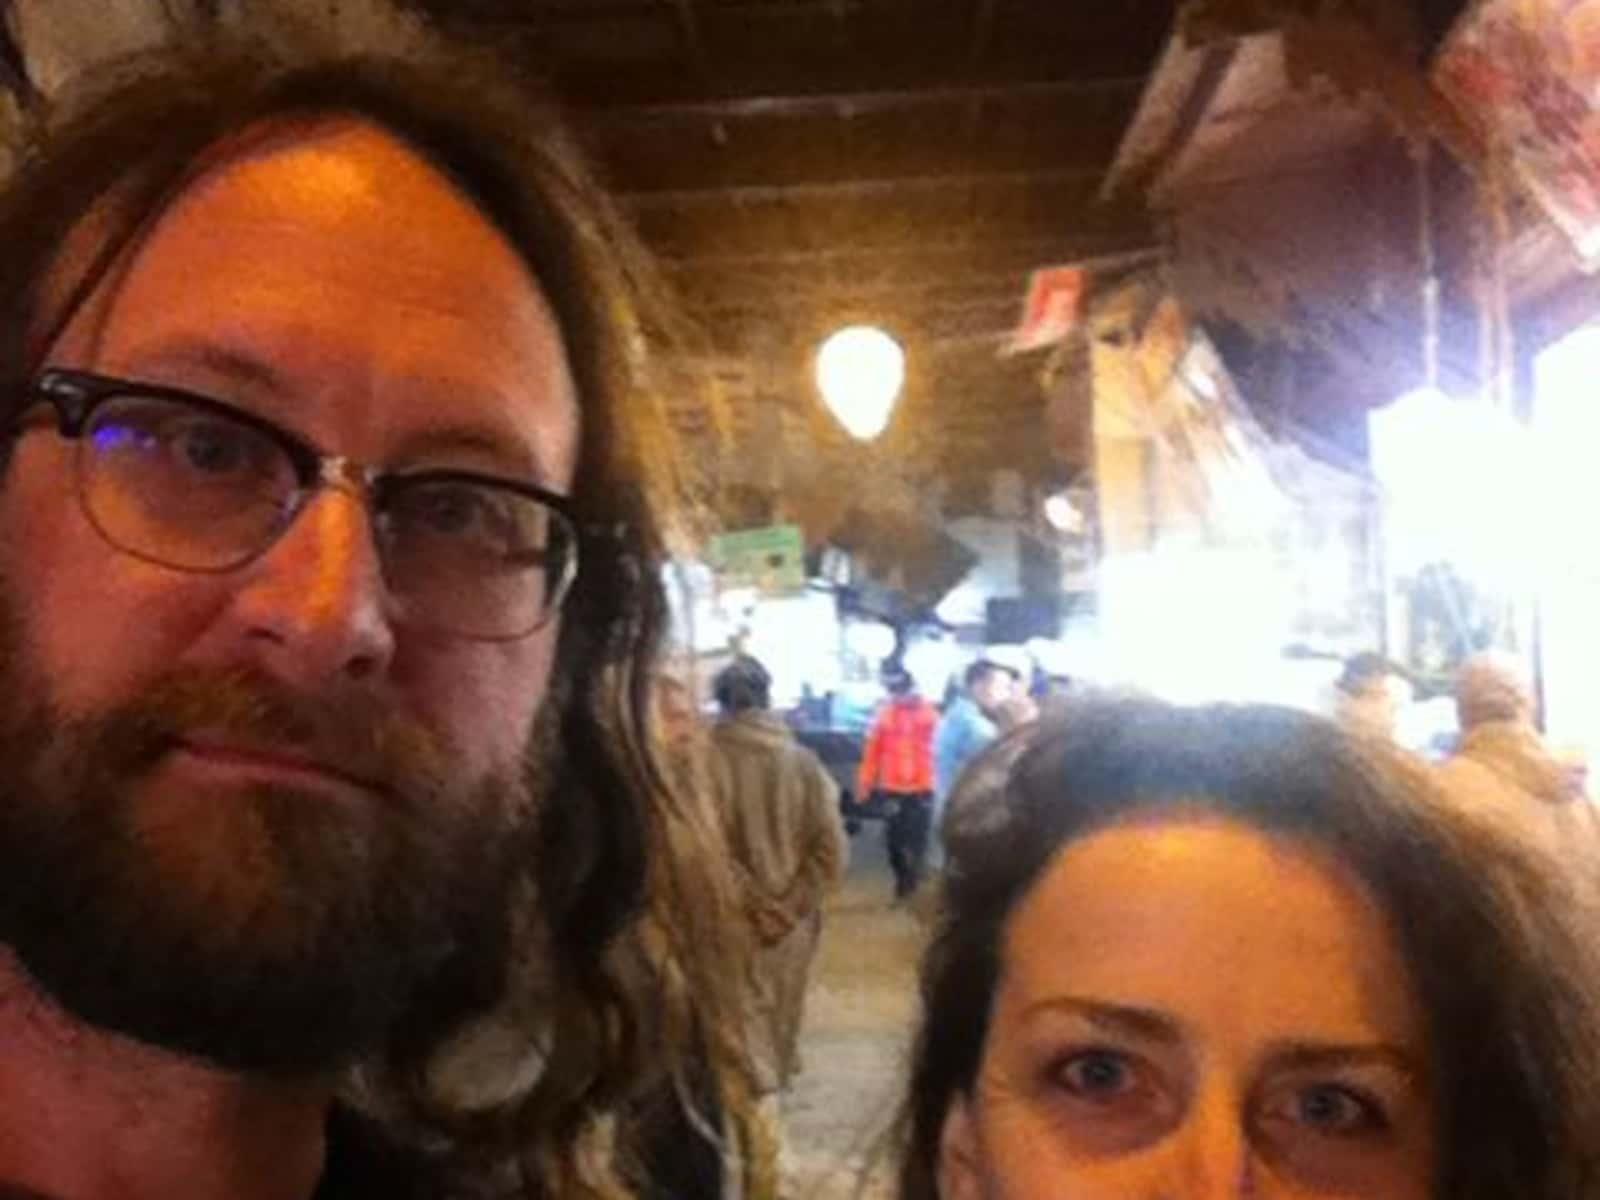 Noortje & Pim from Utrecht, Netherlands